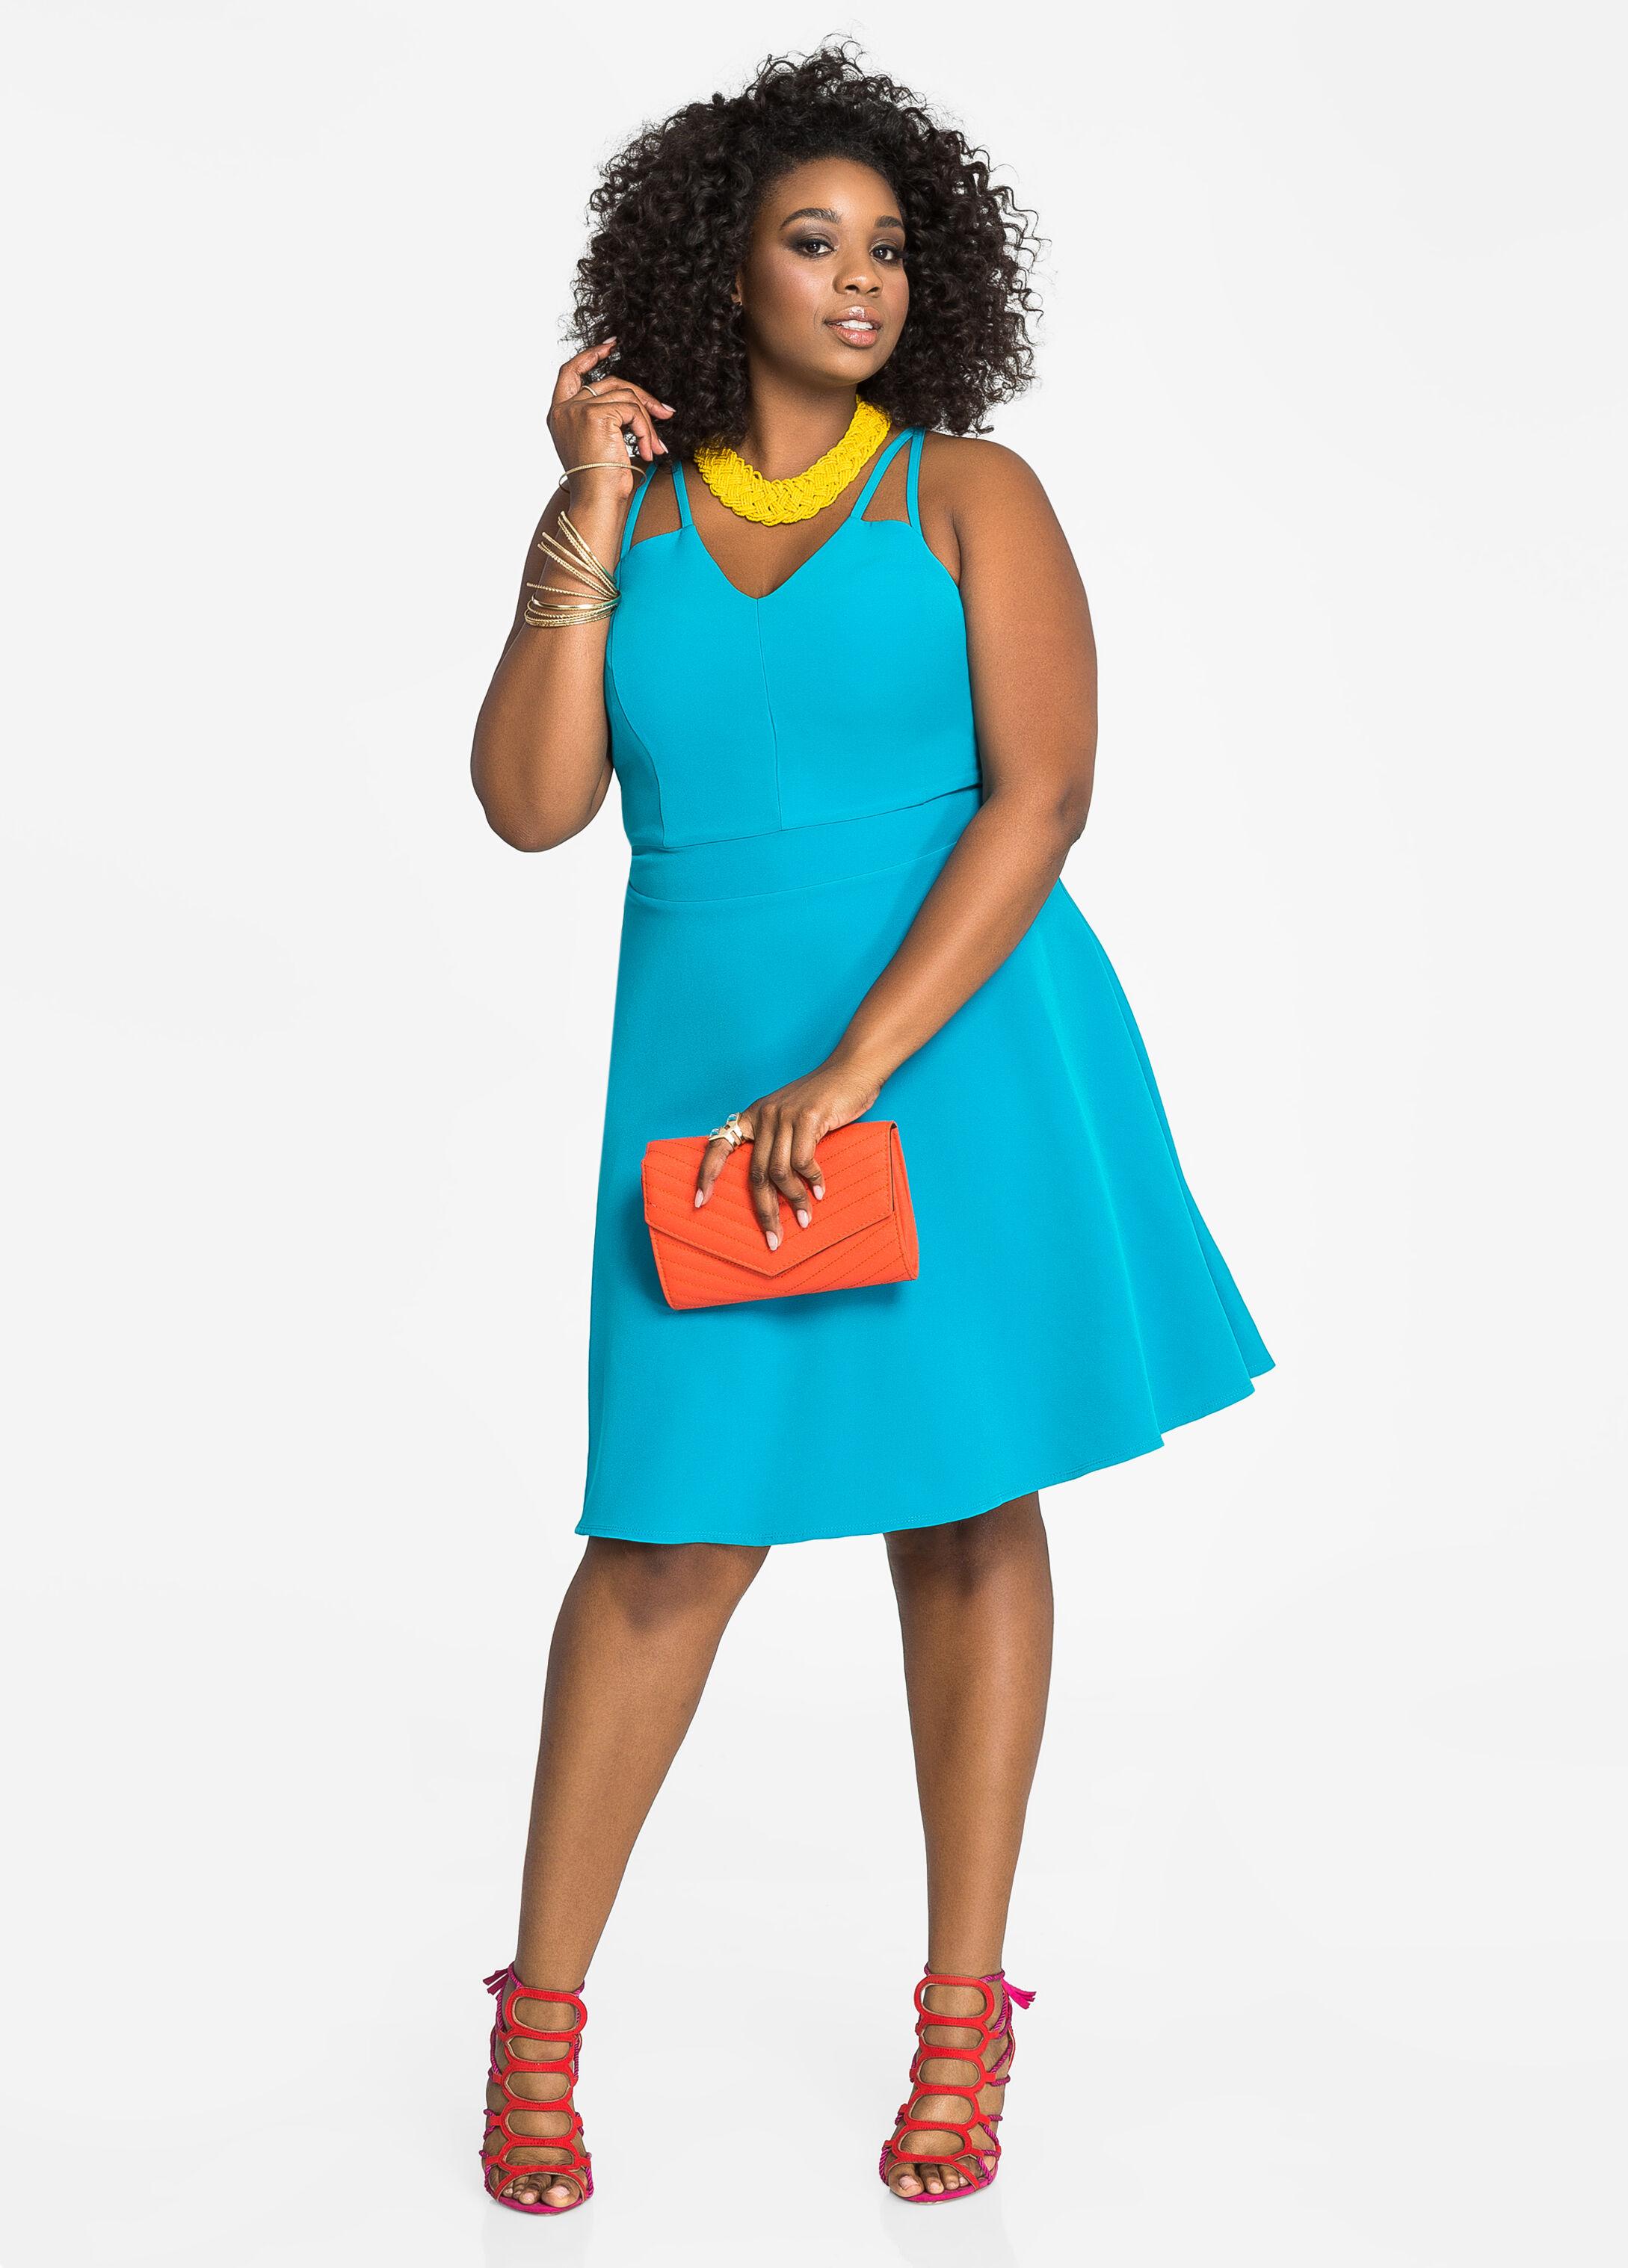 Plus-Size Dresses ǀ Cocktail, Skater, & Maxi Dresses ...